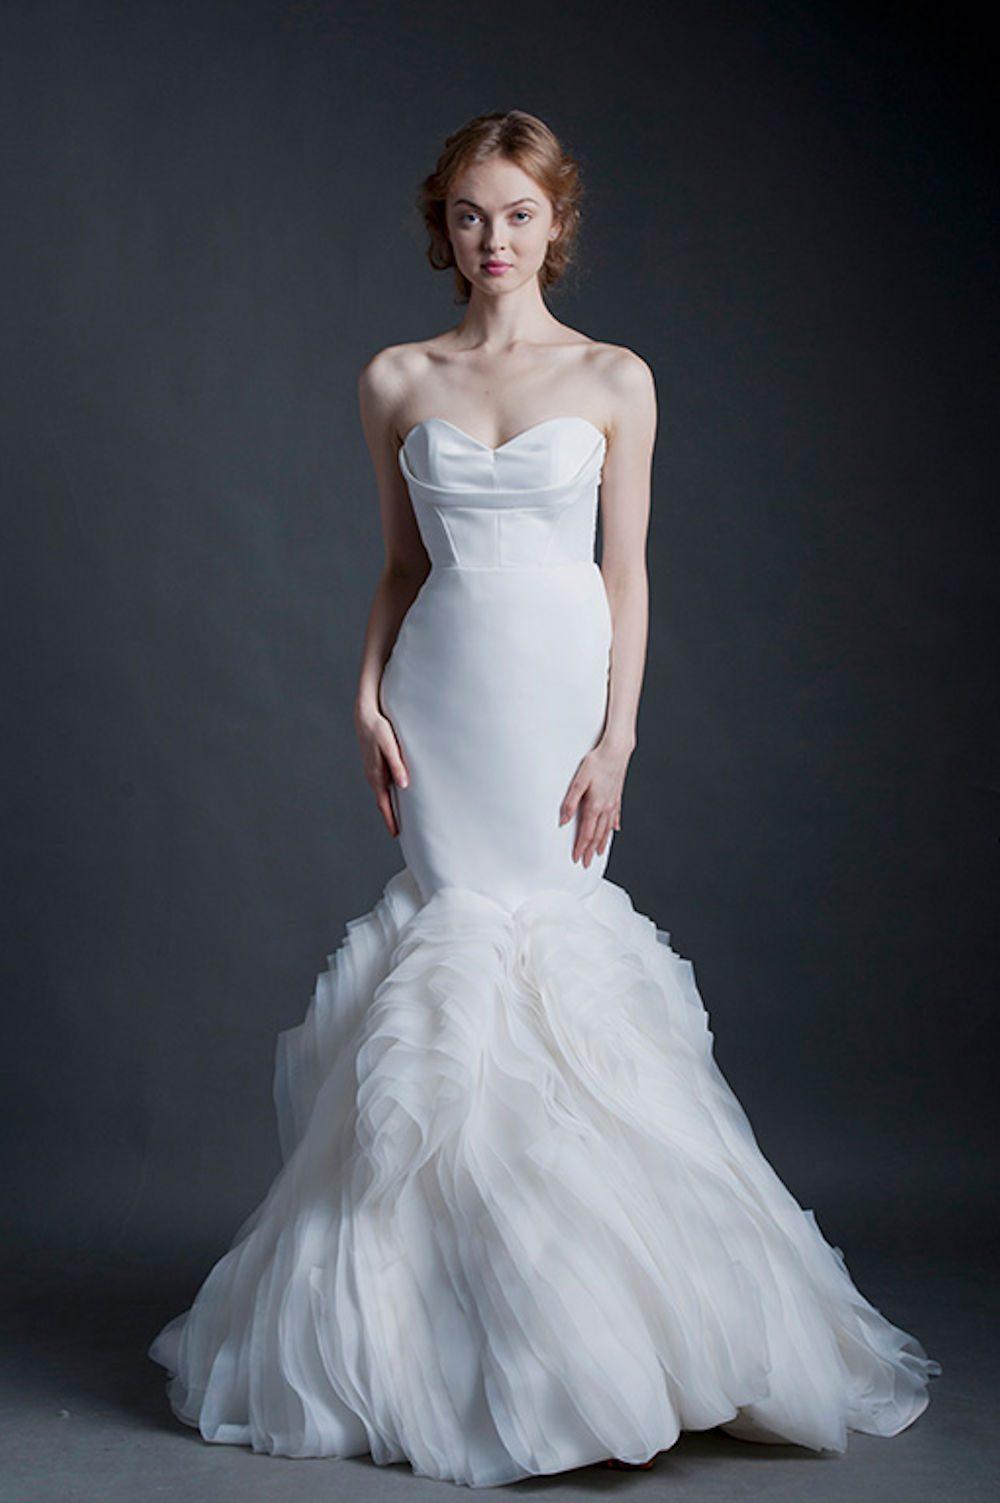 Kim Alpha Bridal - Wedding Dress Melbourne - Layla Mermaid Wedding Dress